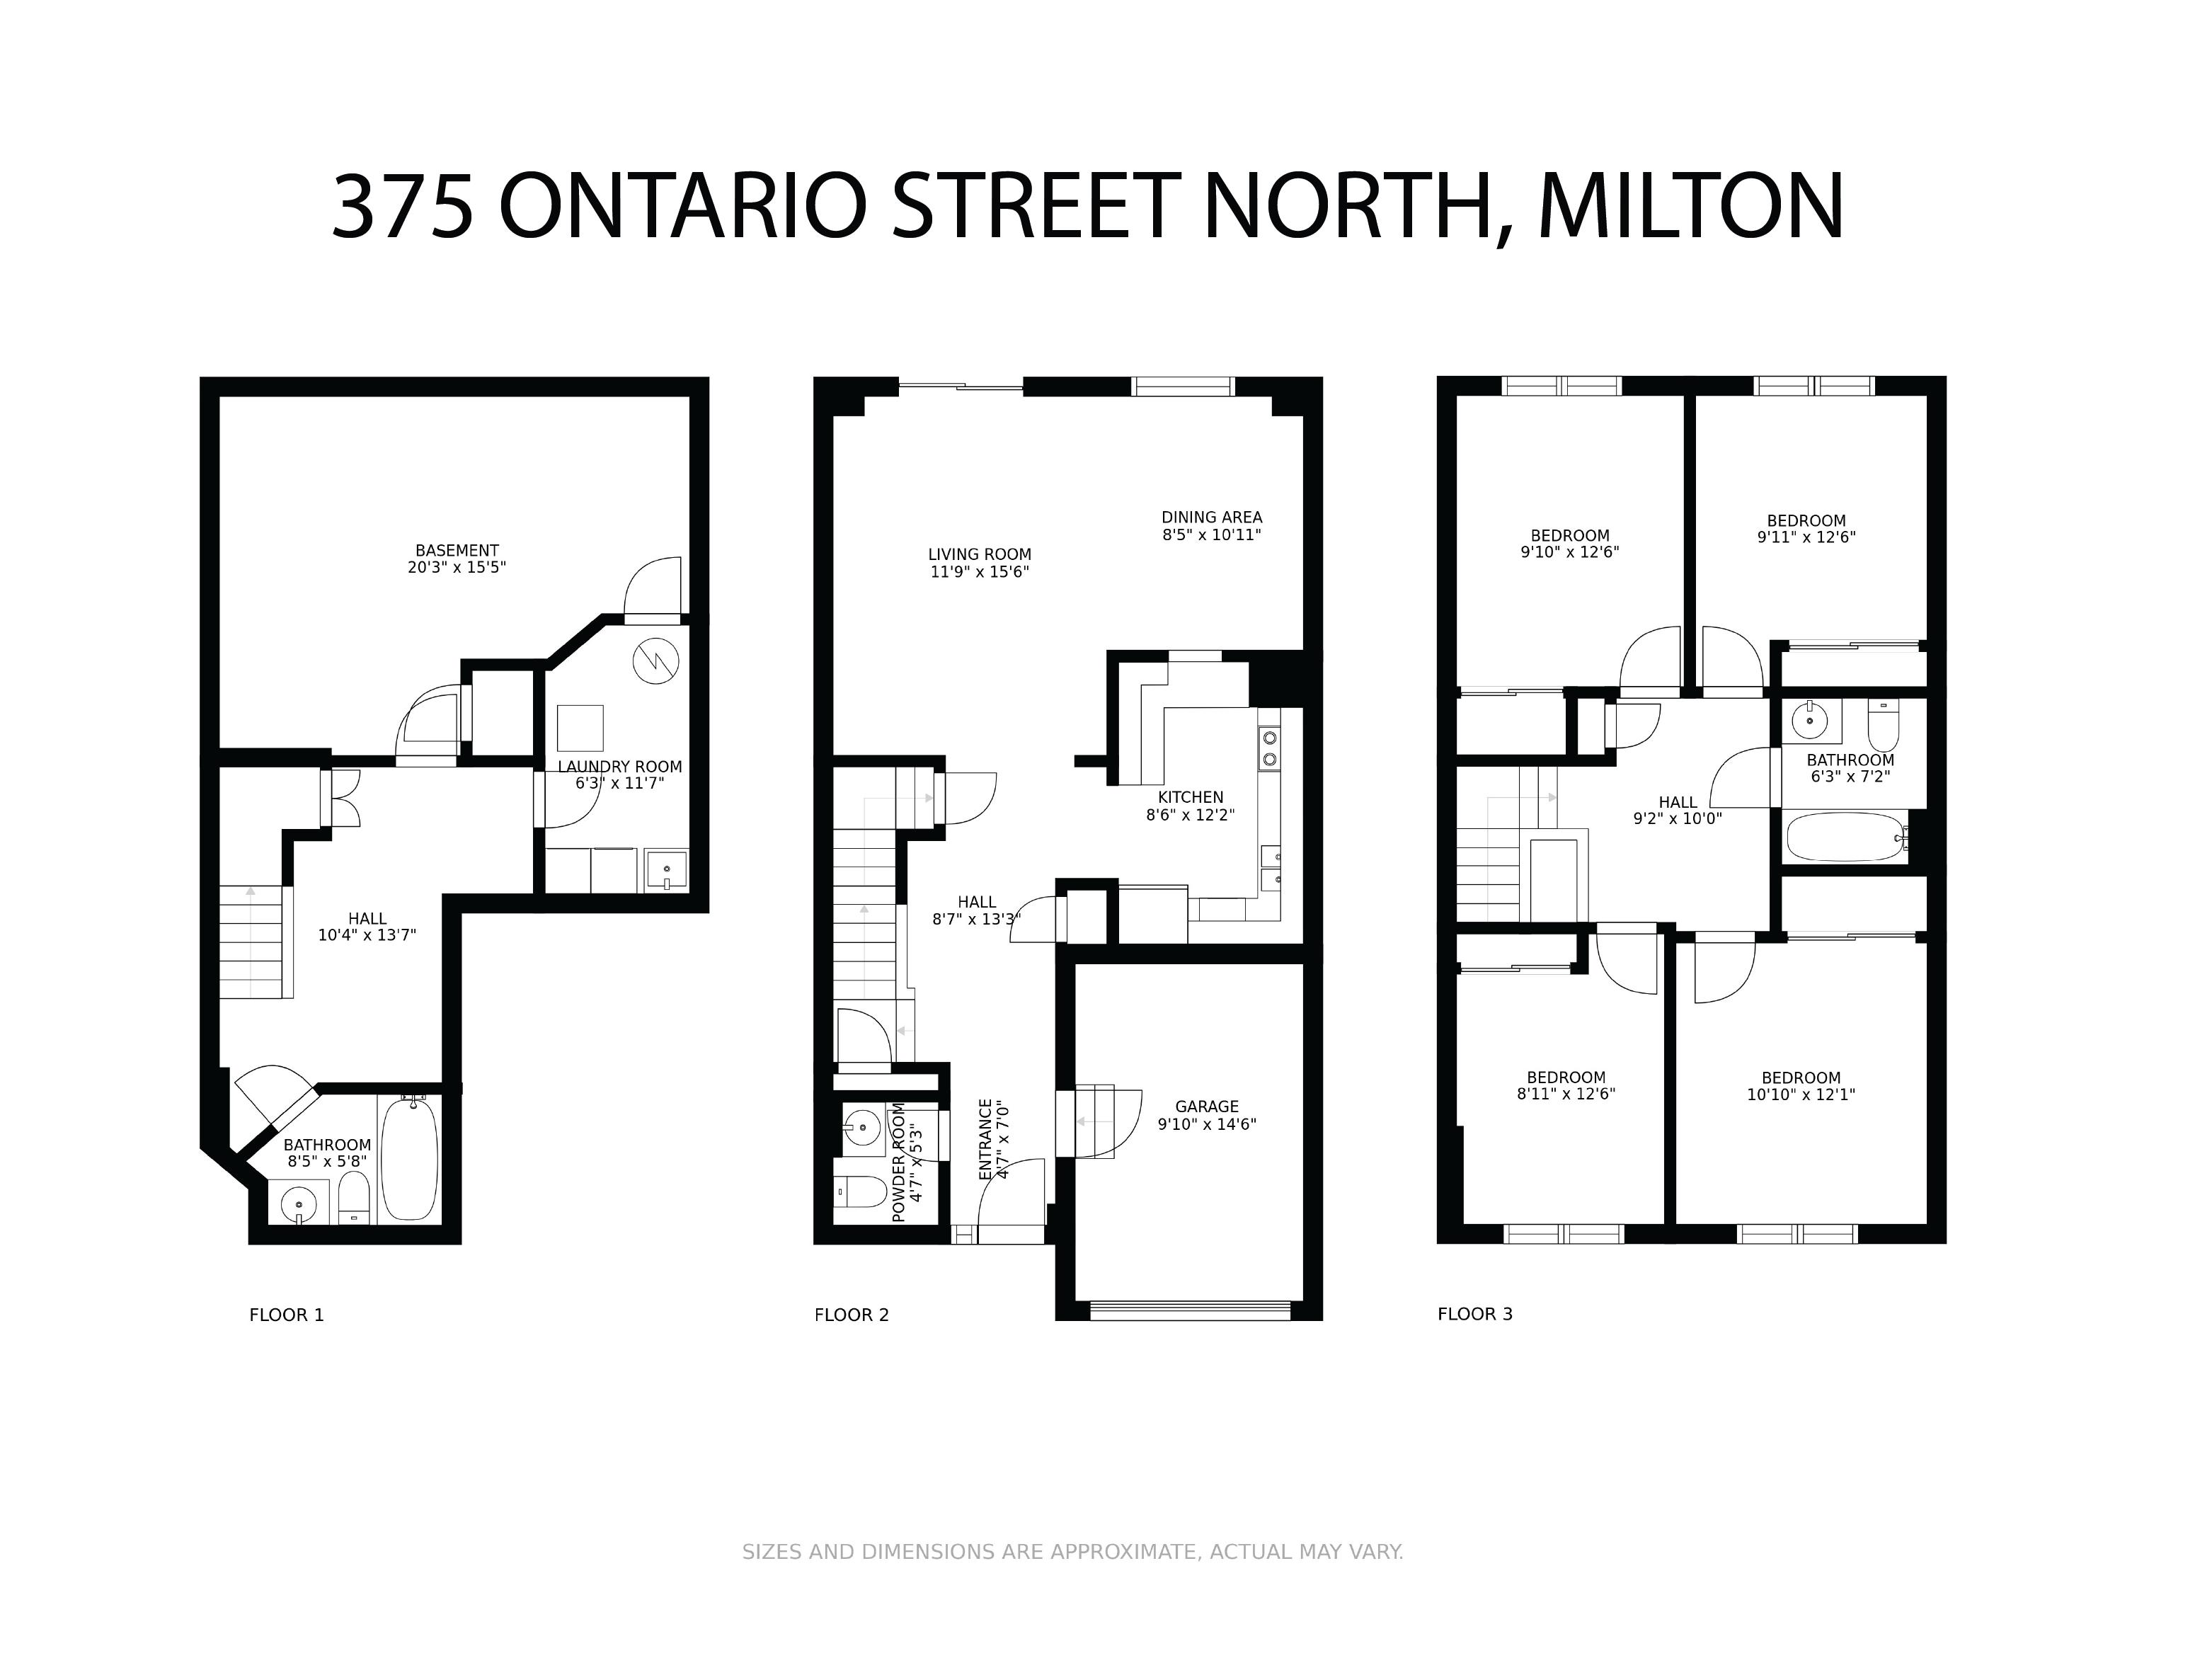 375 Ontario Street North floorplan